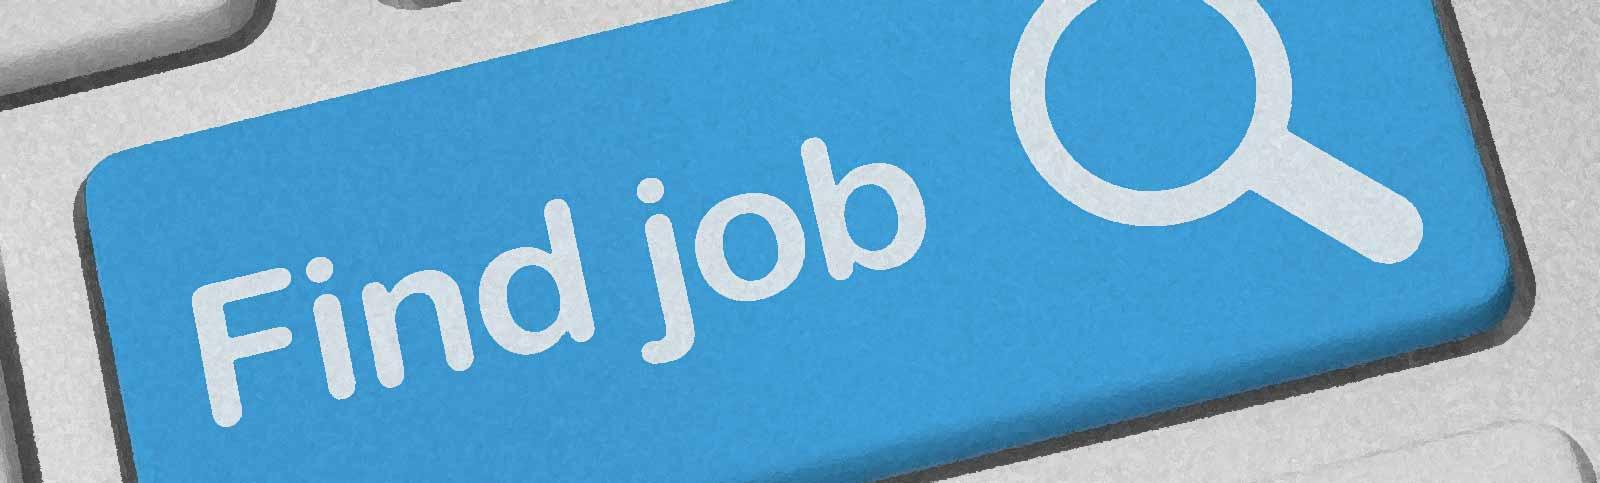 5 Modern Ways To Find A New Job